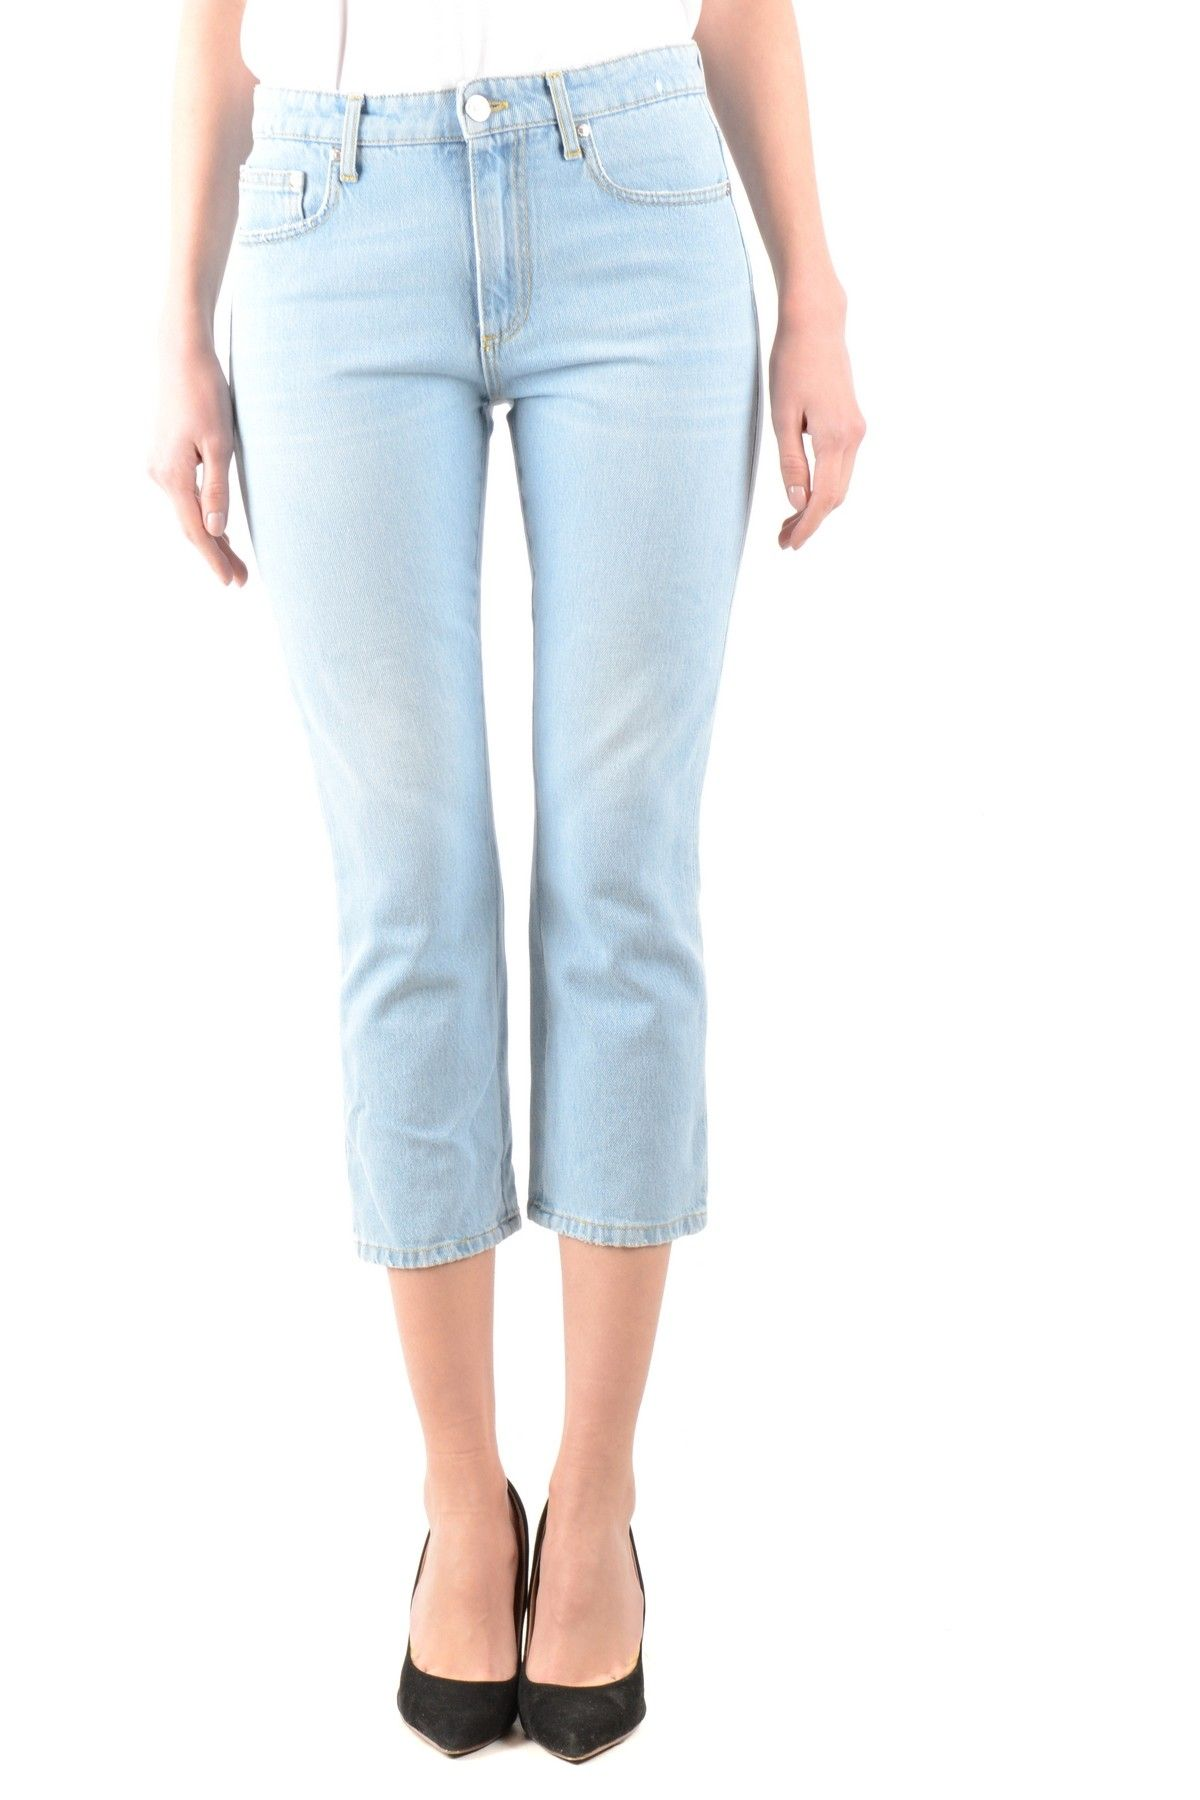 Msgm Women's Jeans In Blue